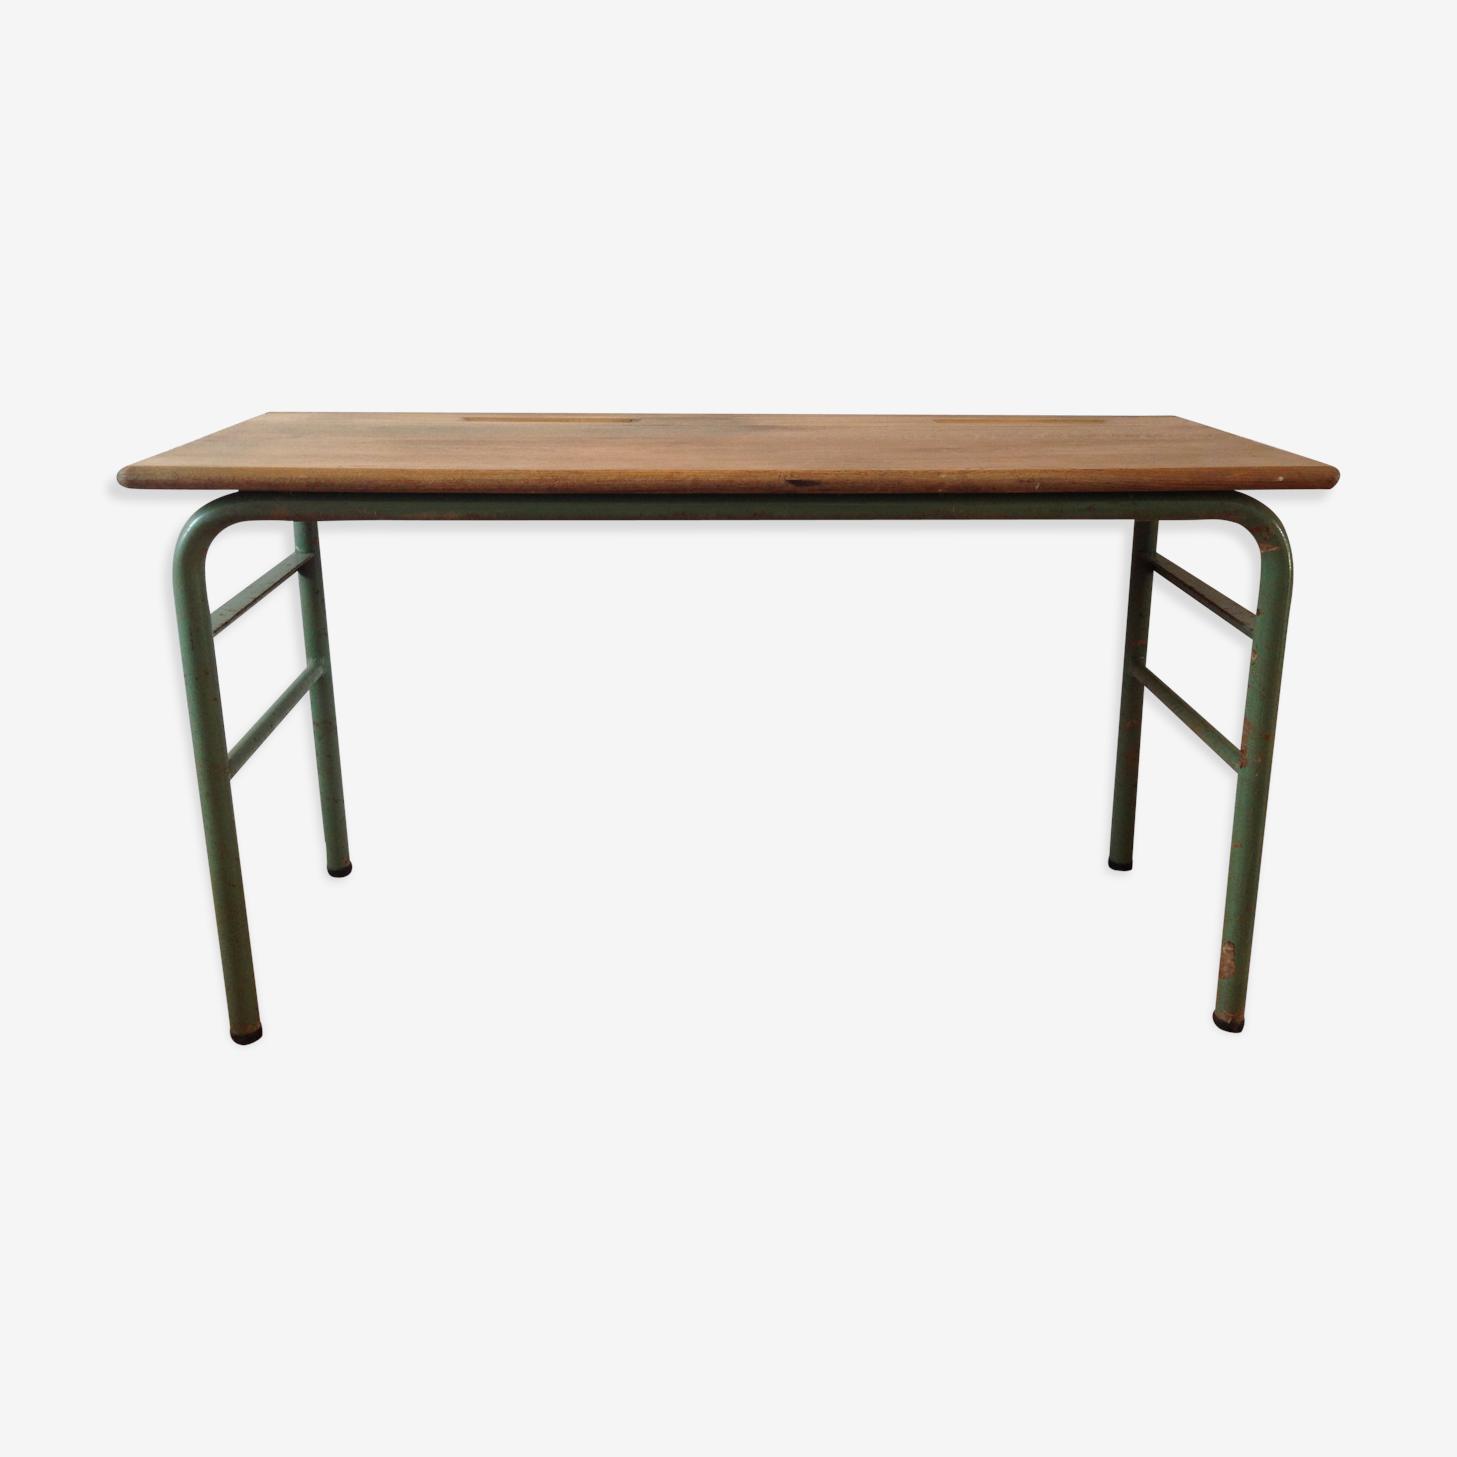 50s, 60s vintage school desk